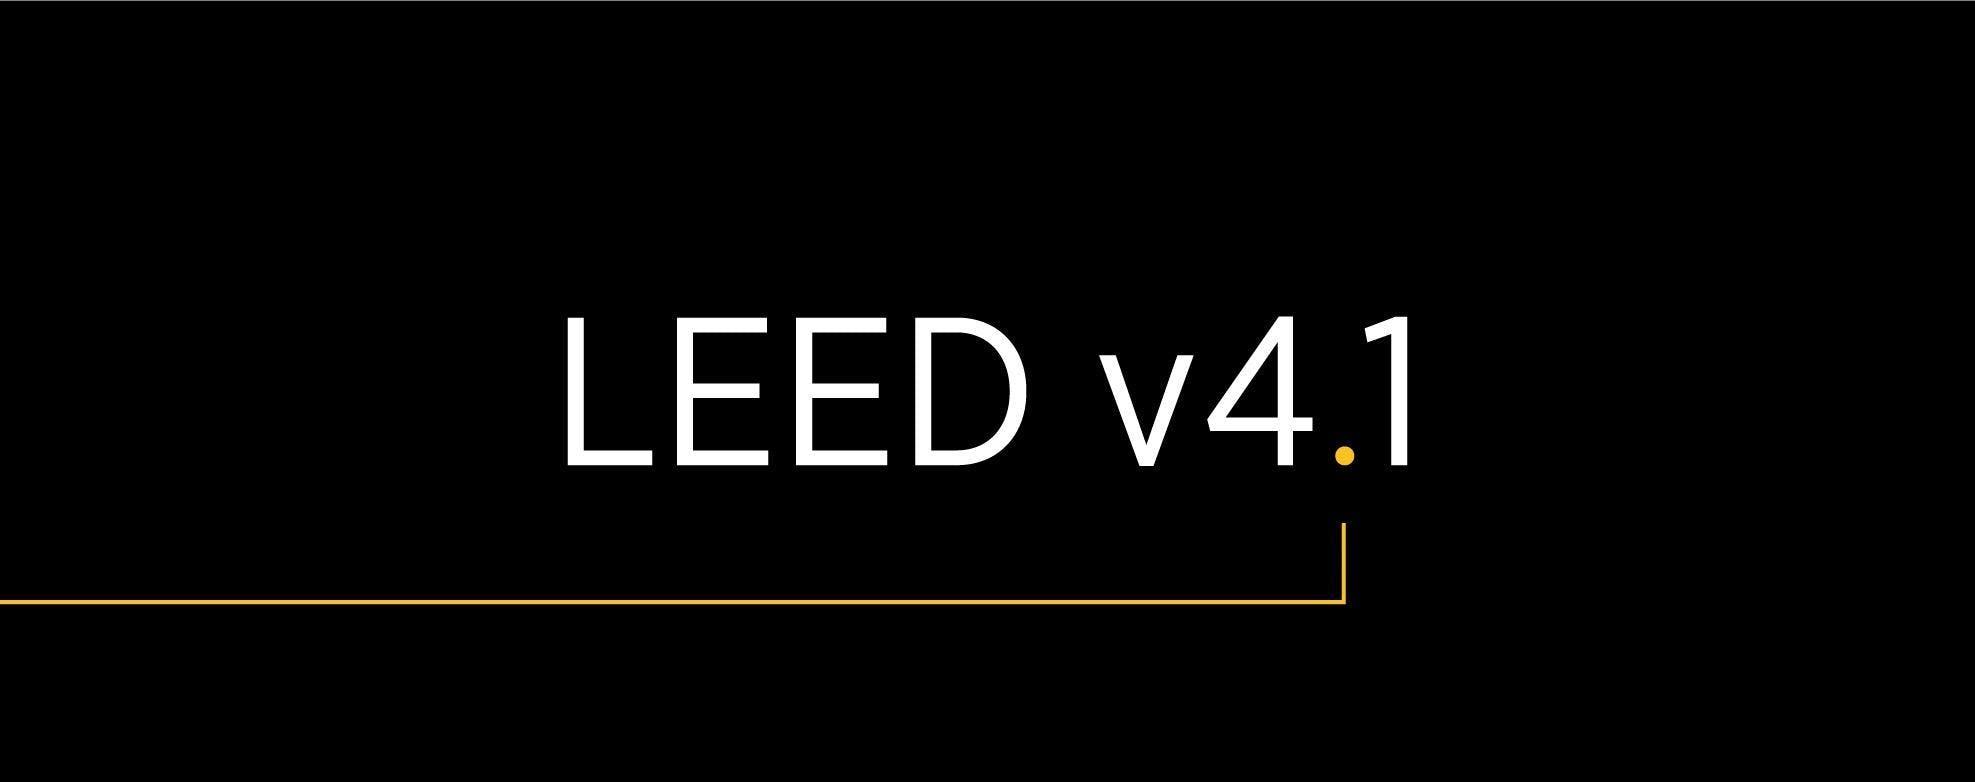 LEED v4.1 Technical Workshop in Berlin